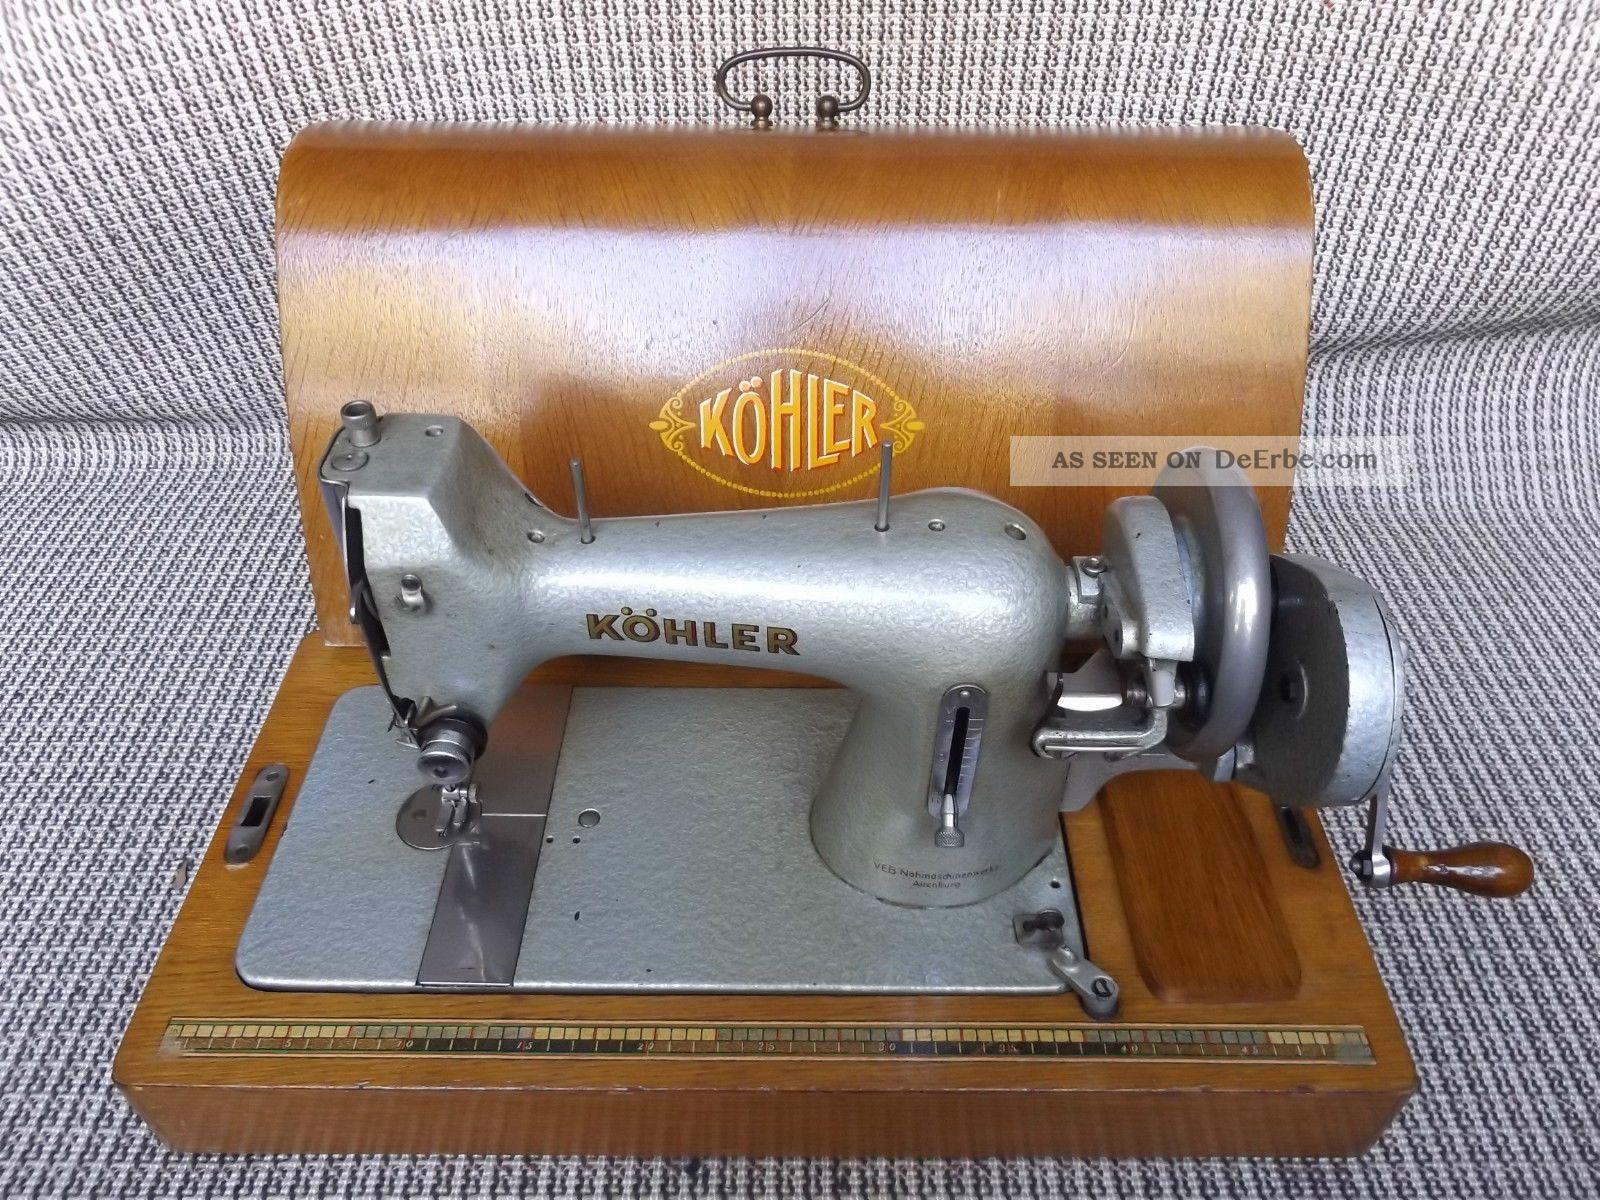 Antike Nähmaschine | Köhler | Altenburg | 1950 | Antique | Gratis (d) Haushalt Bild